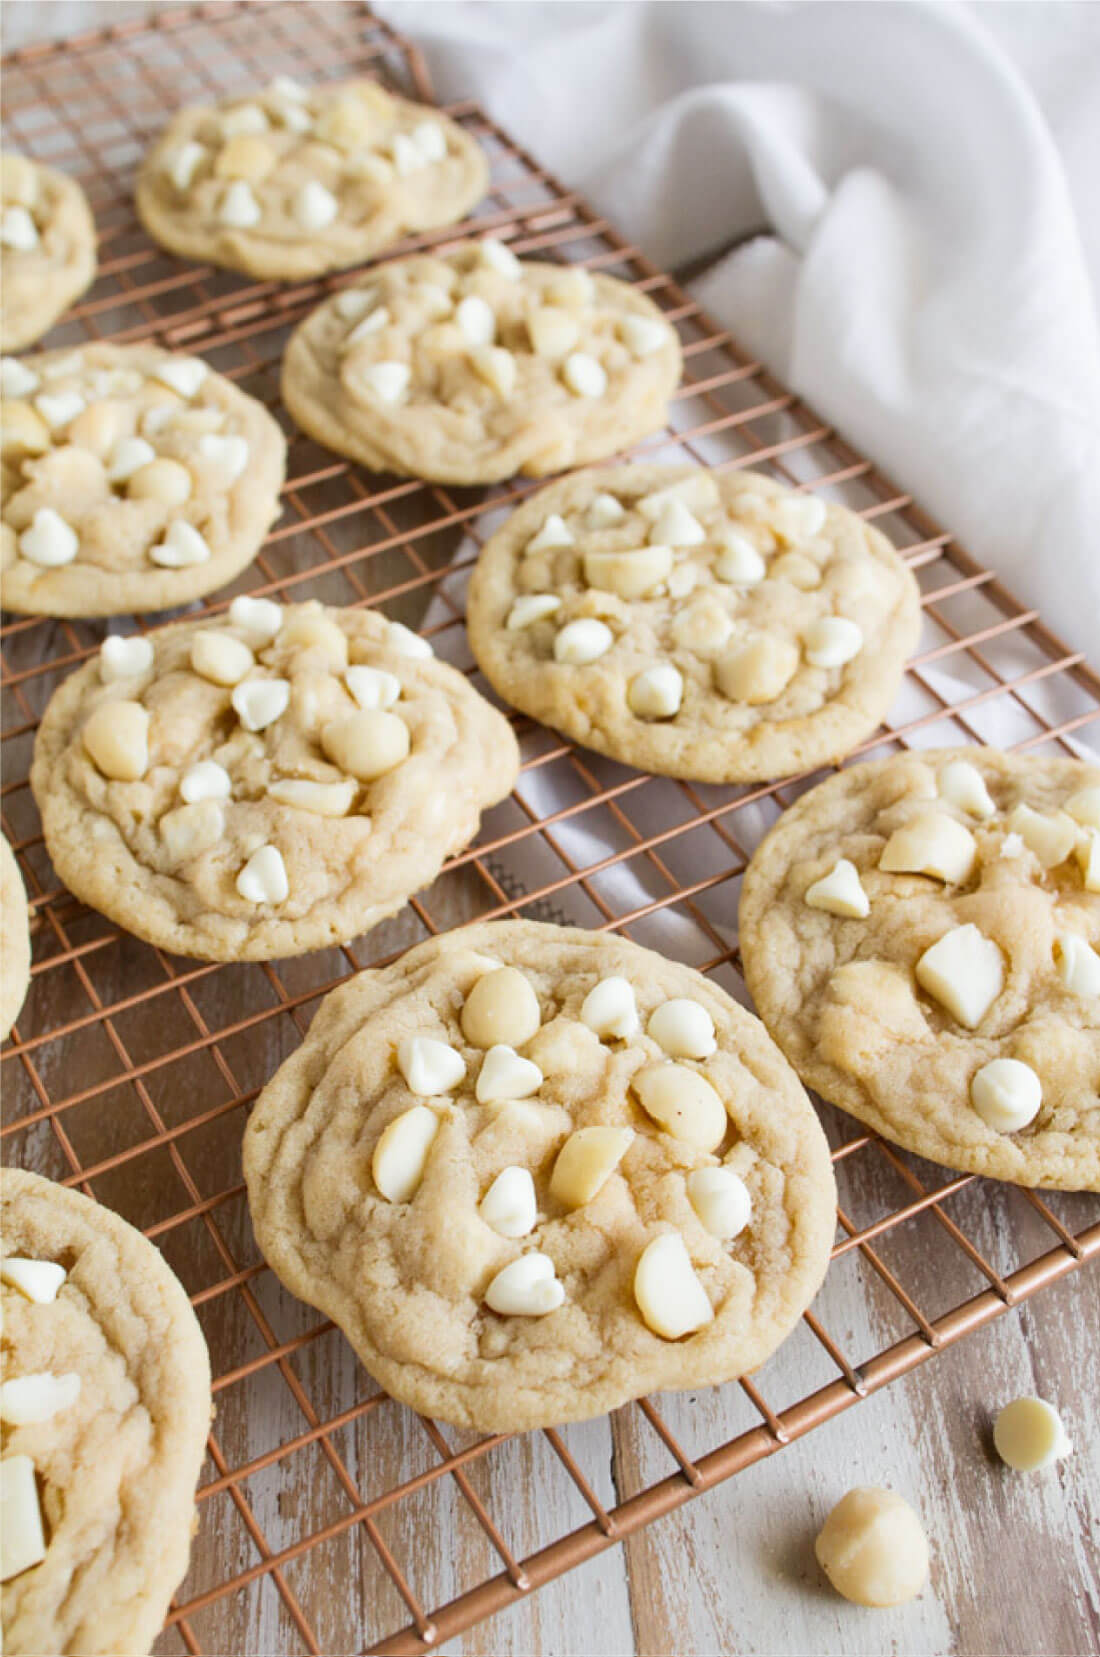 Whole rack of White Chocolate Macadamia Nut Cookies